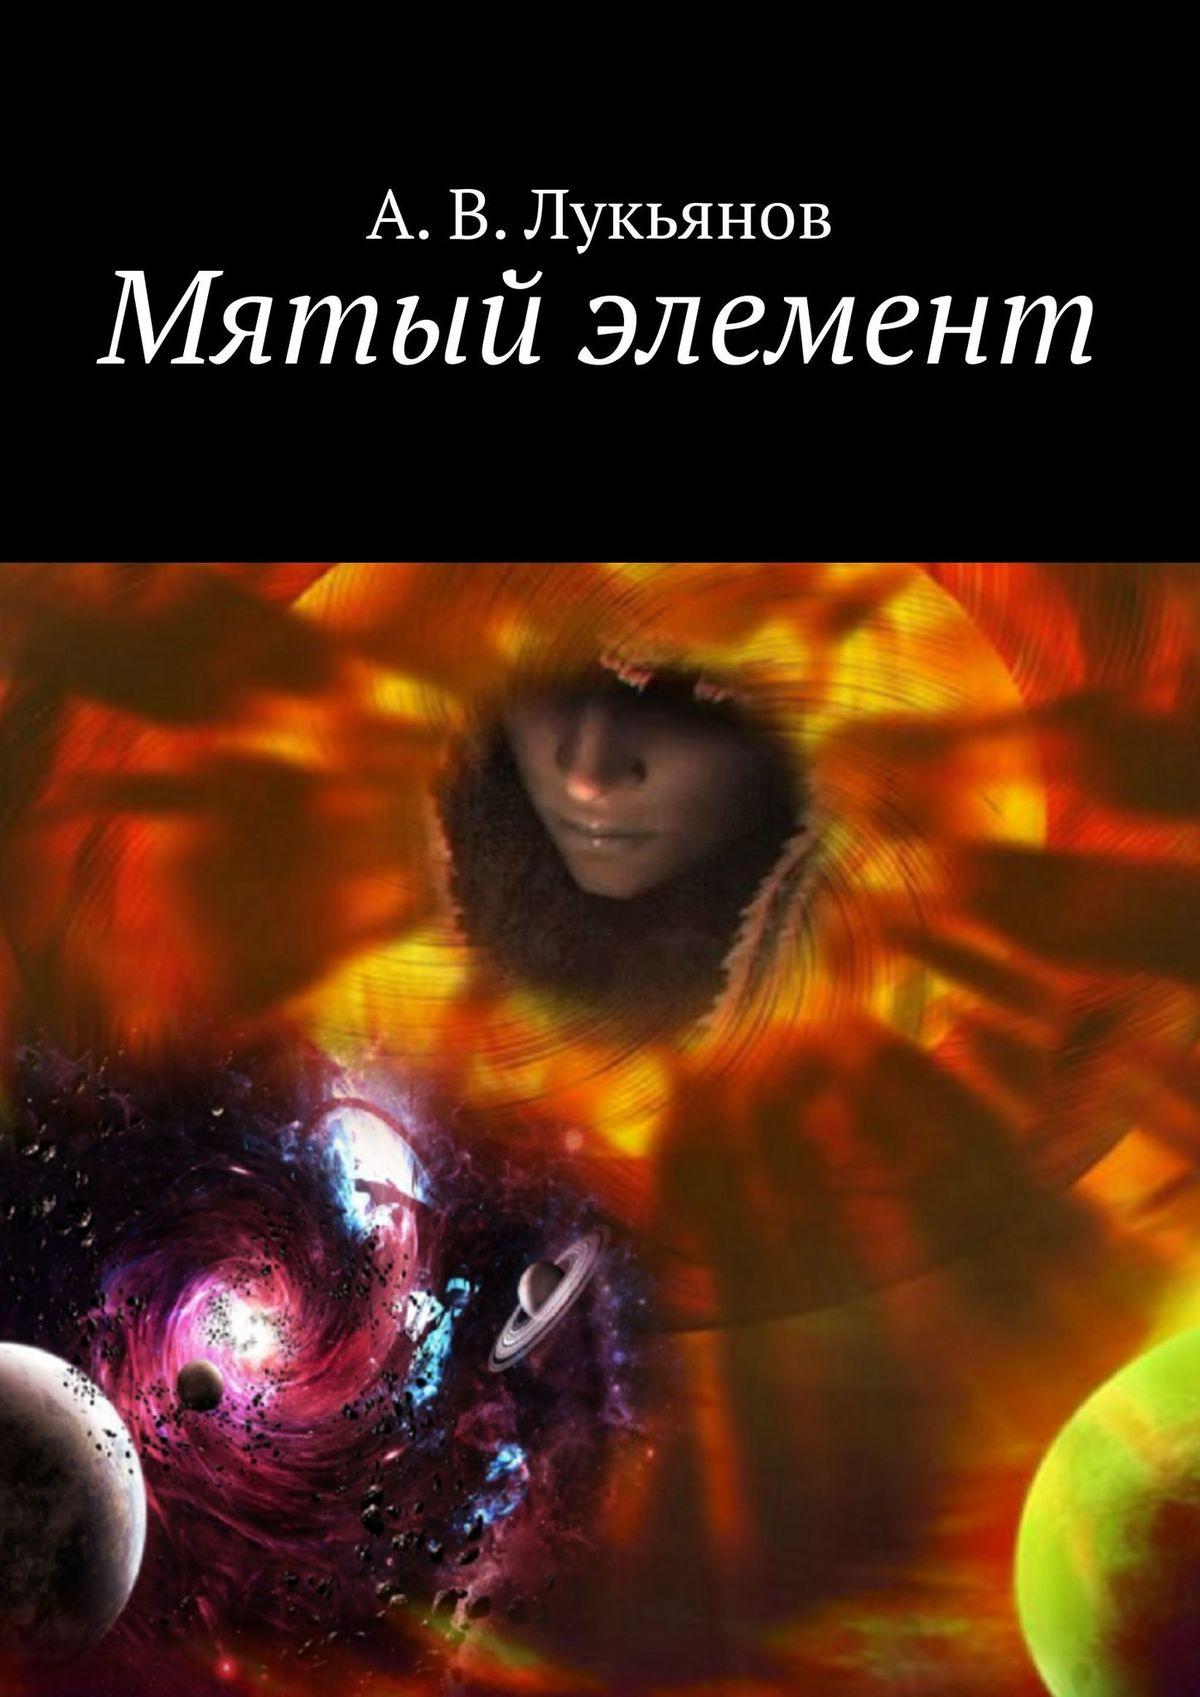 Александр Лукьянов. Мятый элемент